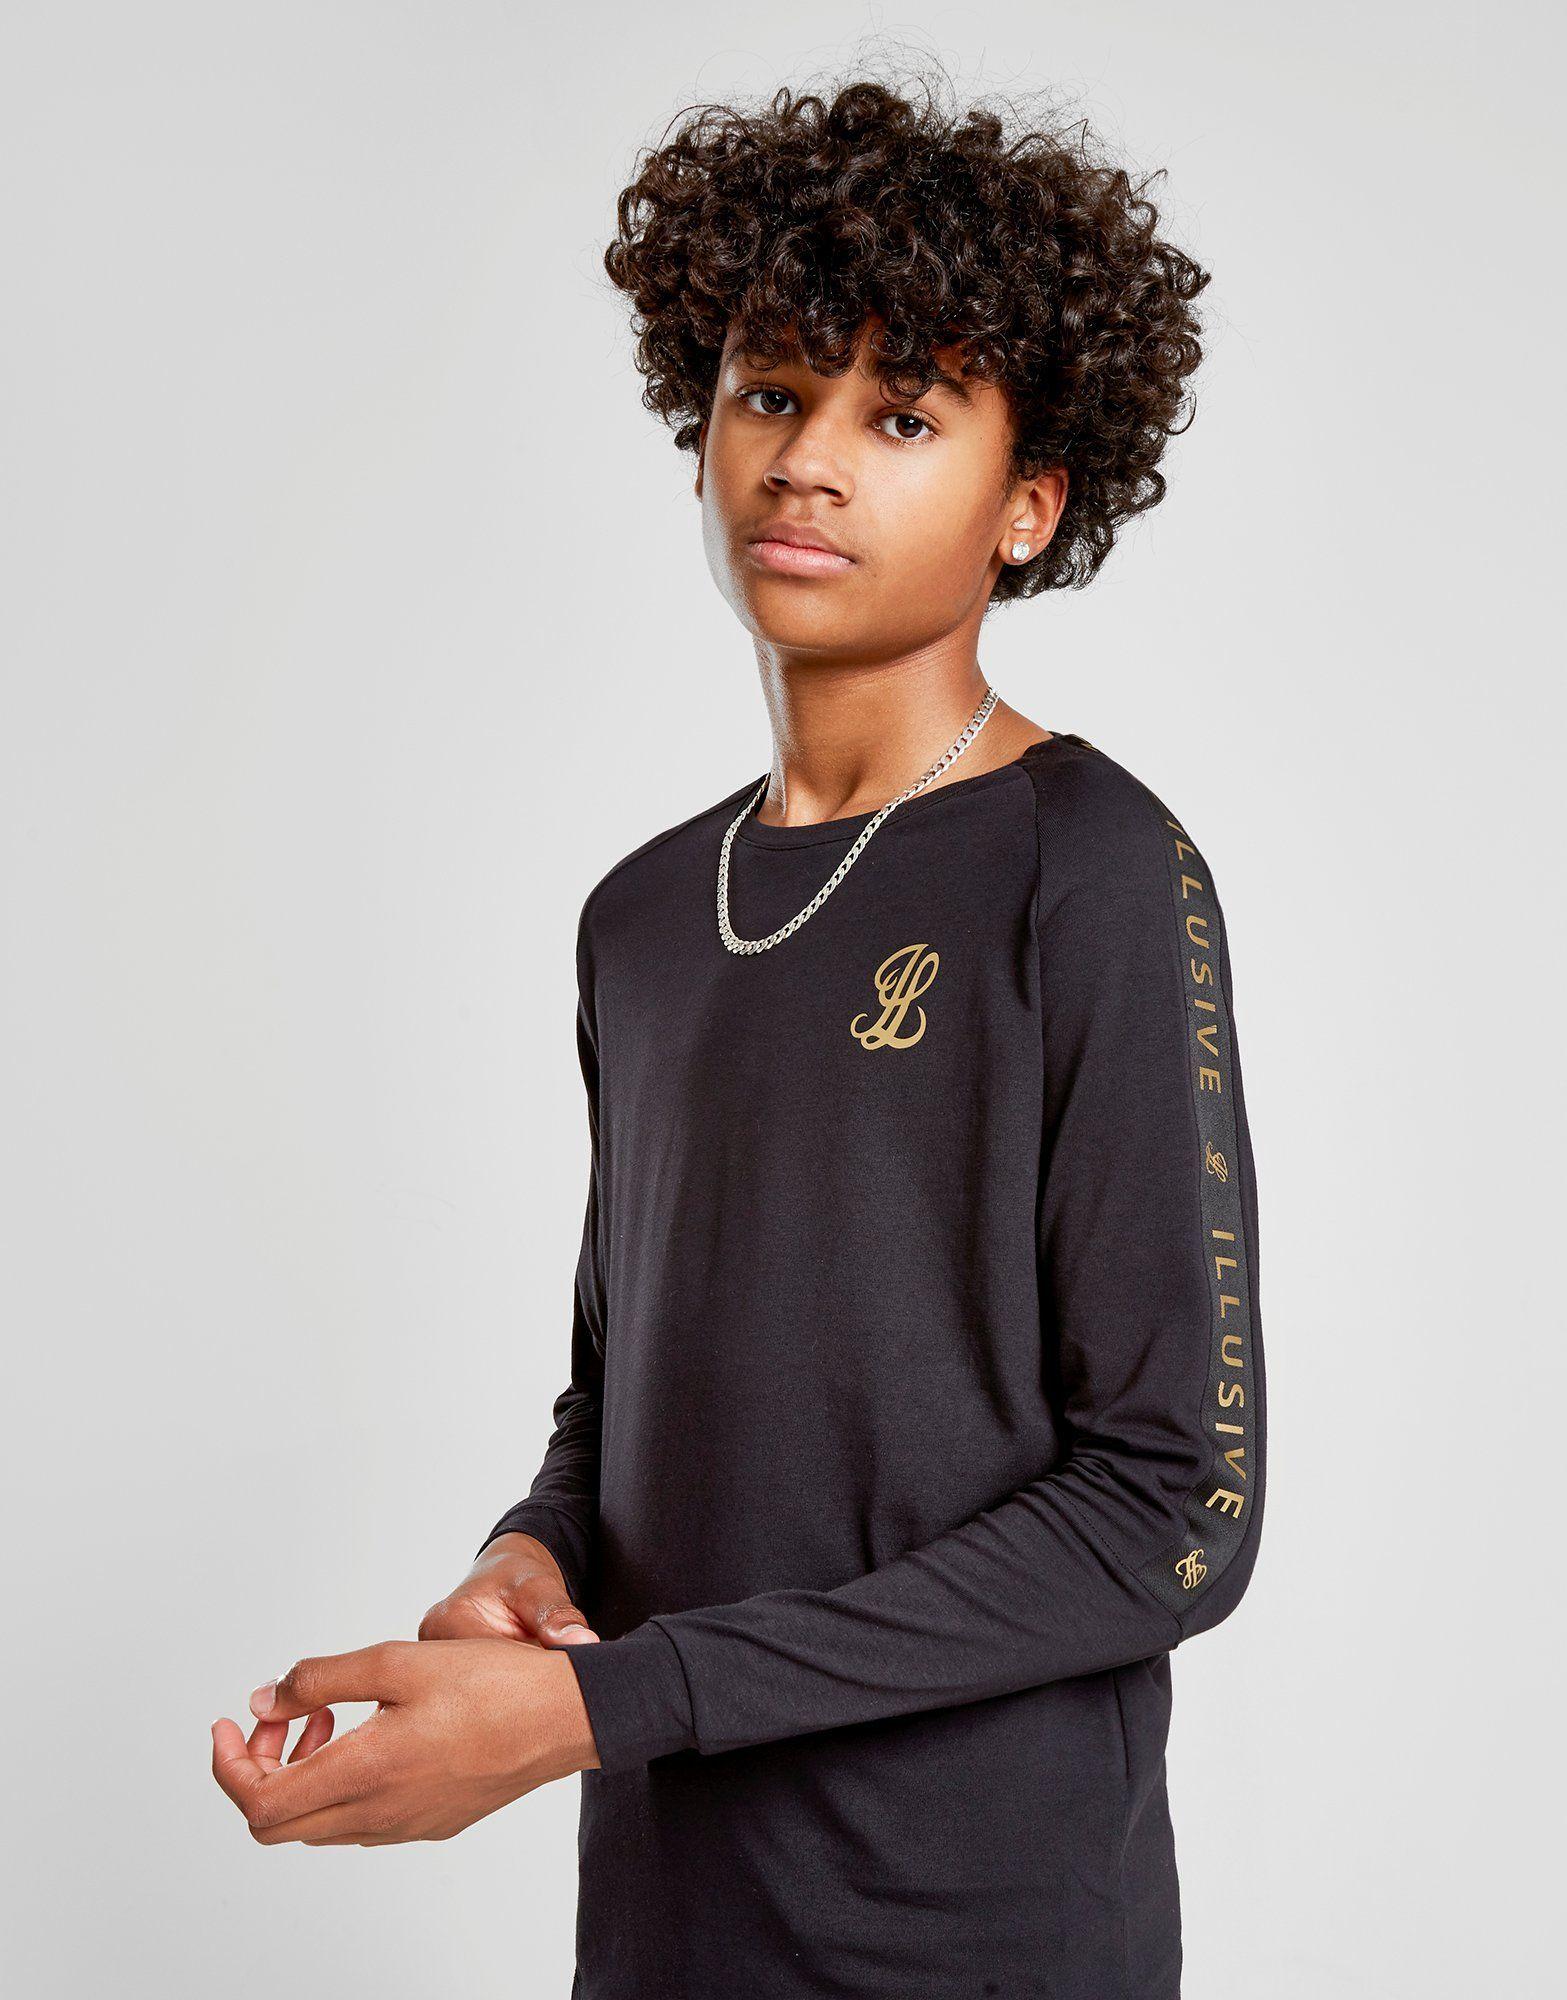 Shirt Tape T Abrigos À London Manches Junior Longues Illusive vcP16Uc